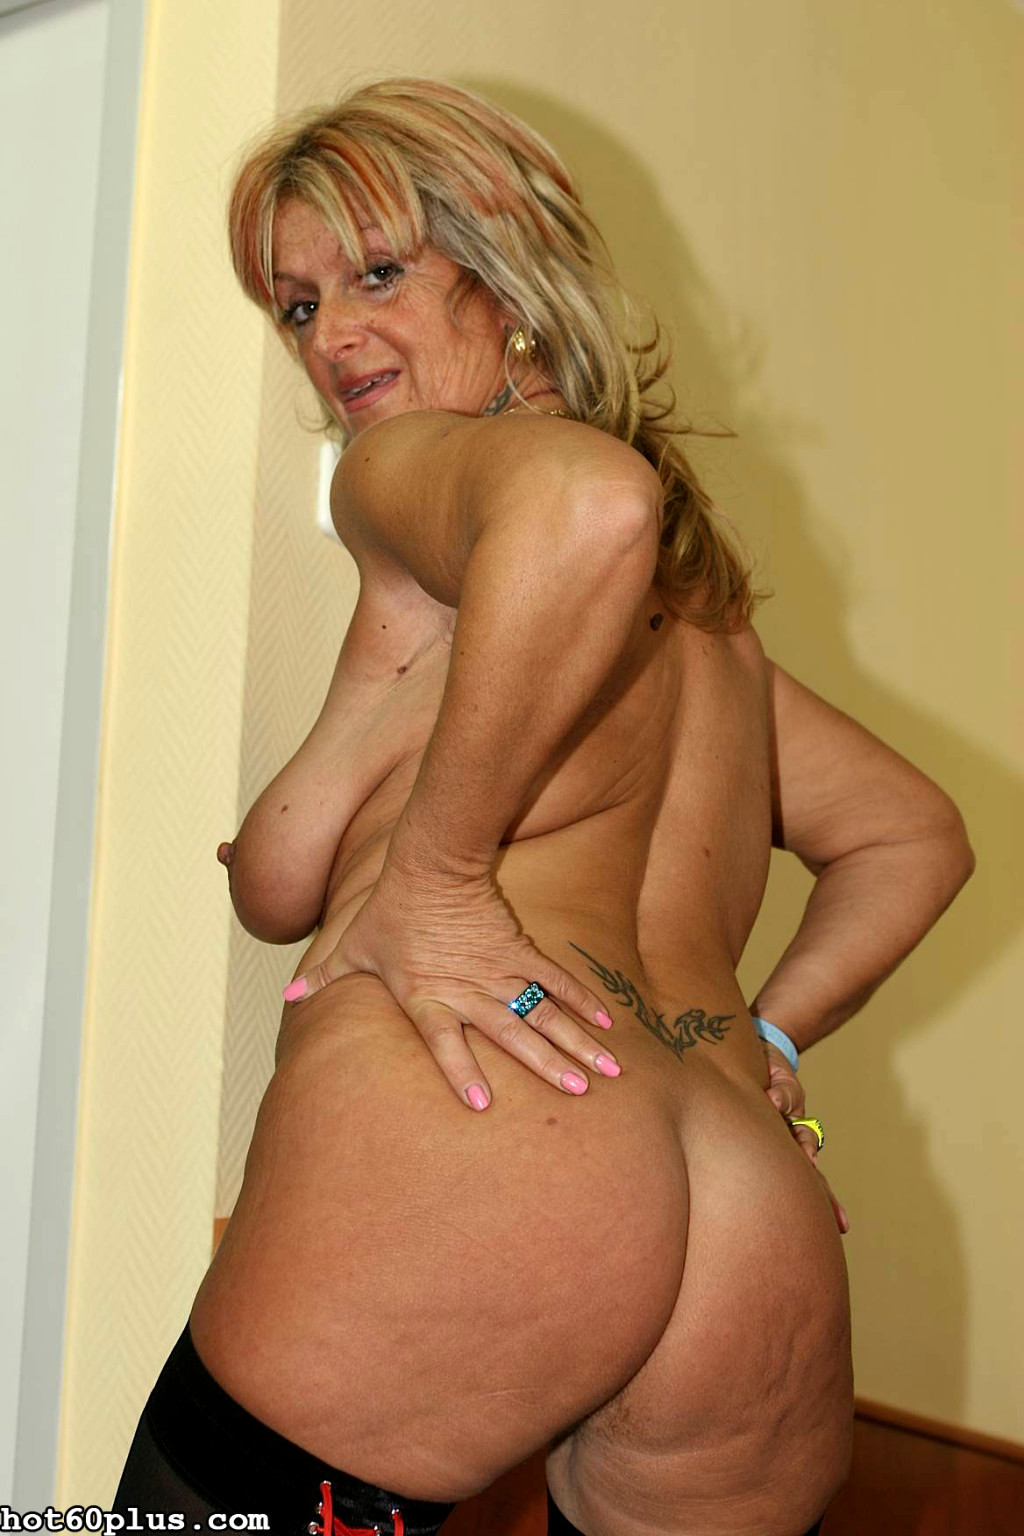 Babe Today Hot 60 Plus Hot60Plus Model Charming Mature Vip Photos Porn Pics-1521